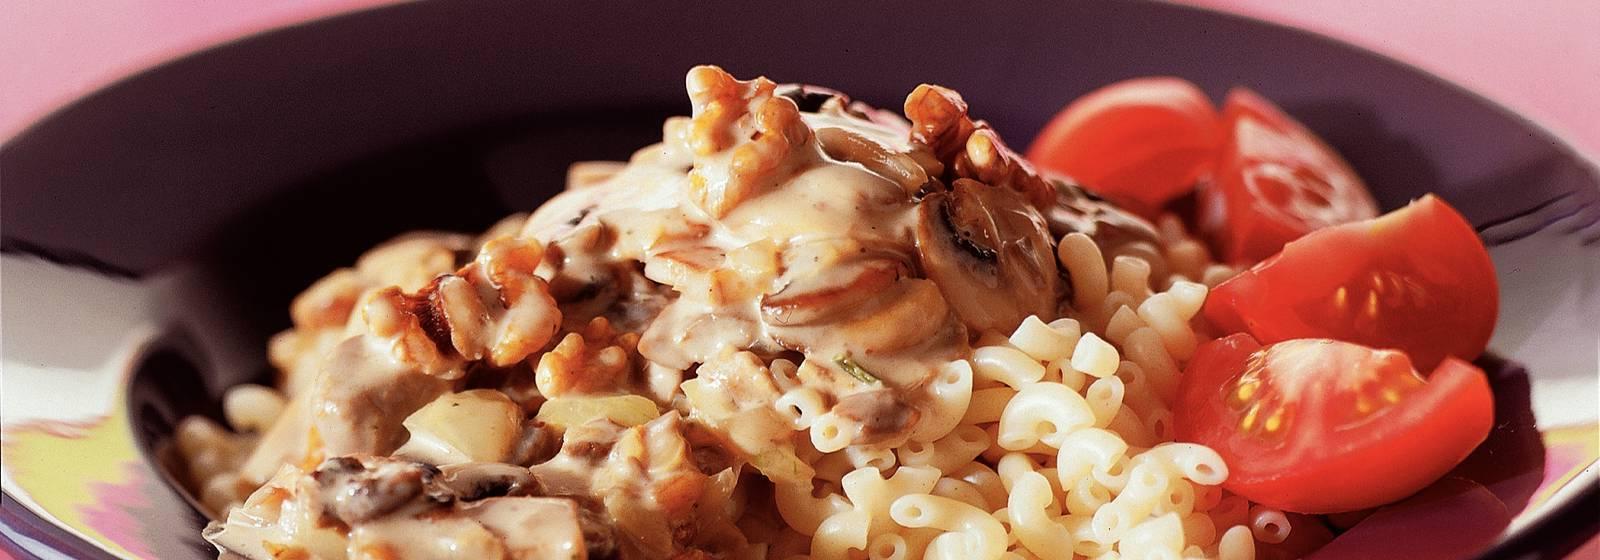 Macaroni with mushroom-nut sauce